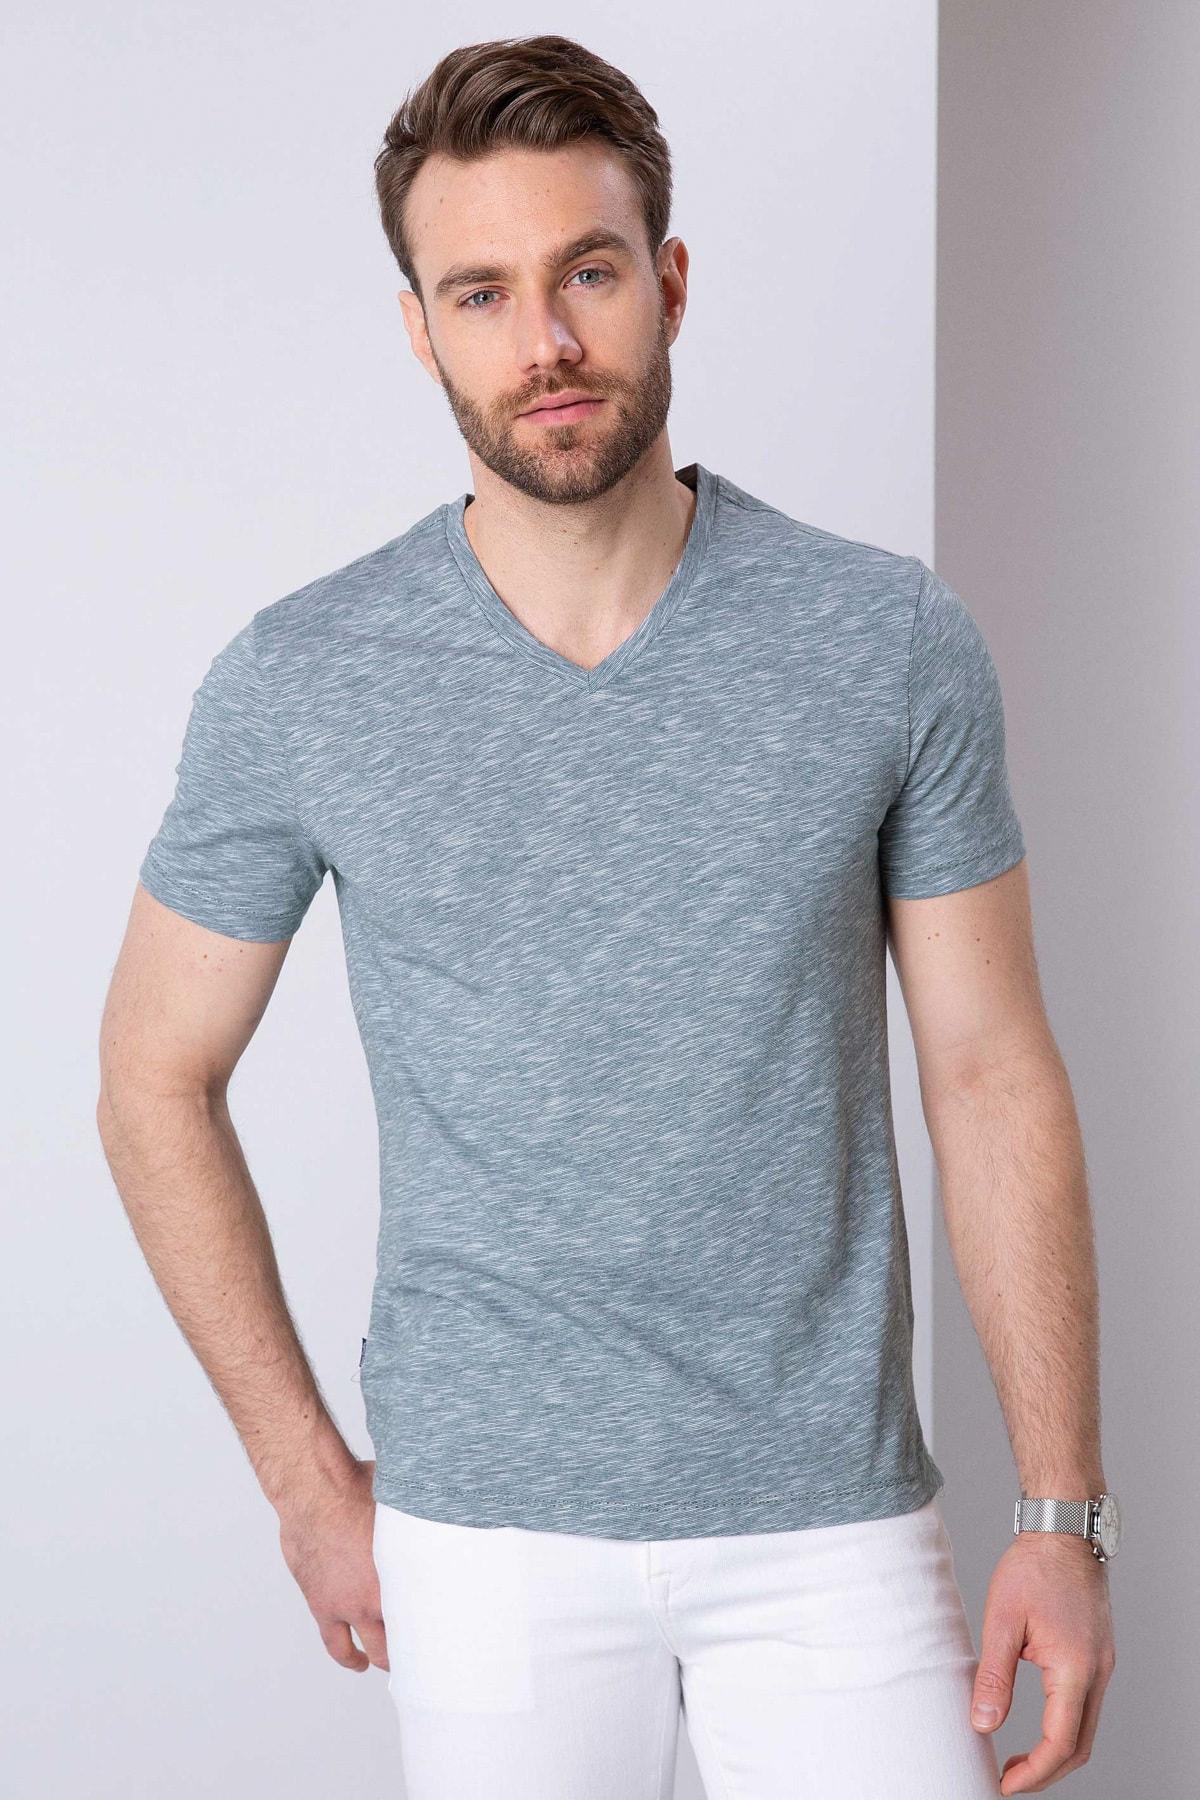 Pierre Cardin Erkek Koyu Yeşil Slim Fit T-Shirt 1